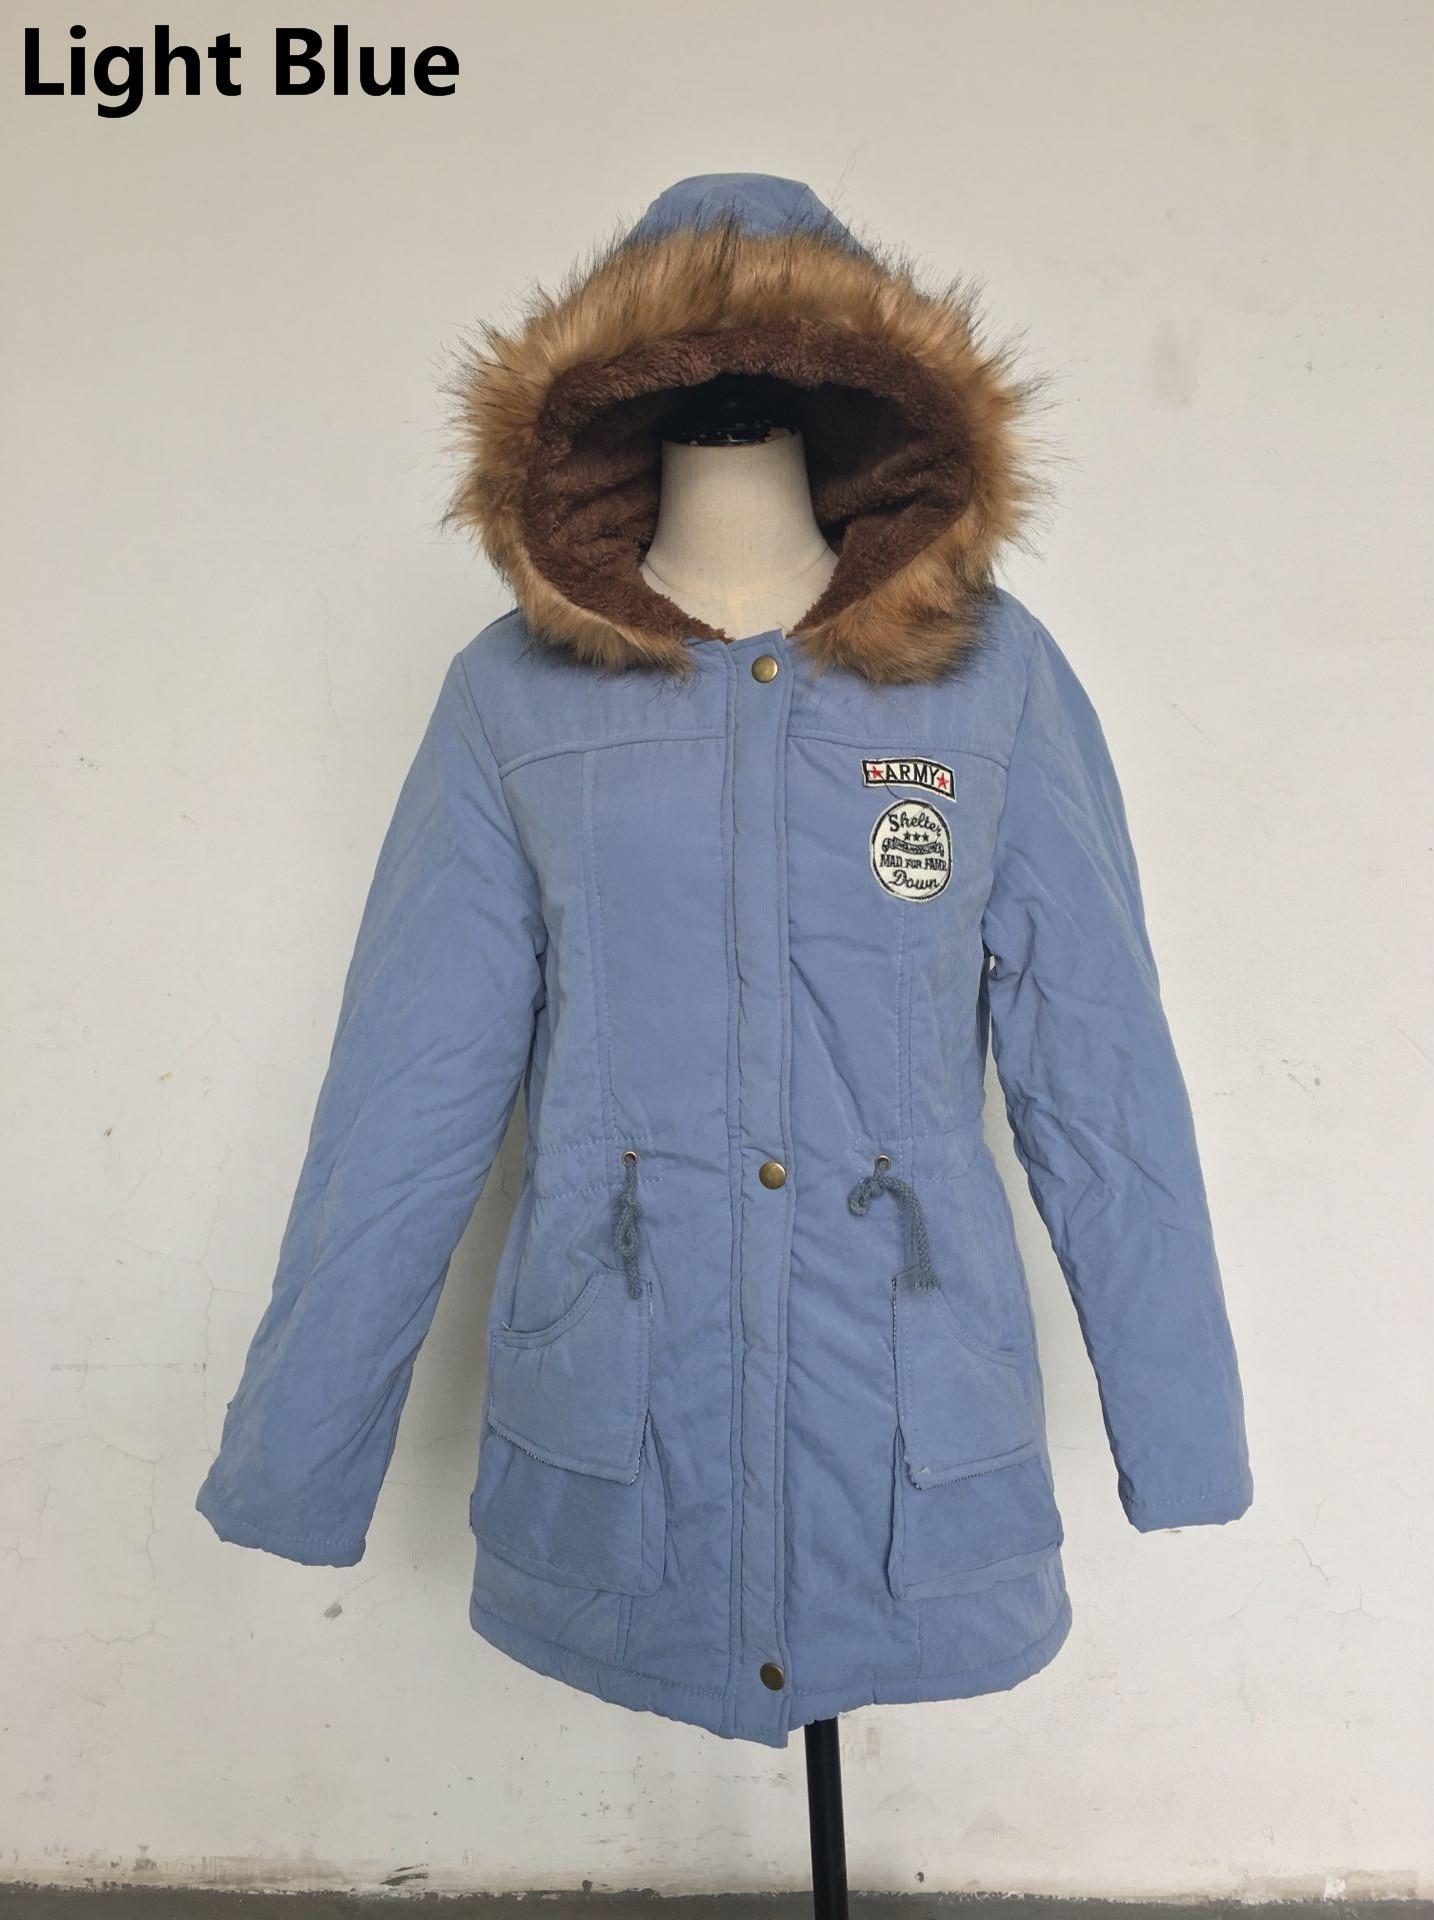 HTB1PdqKoStYBeNjSspaq6yOOFXae Women Parka Fashion Autumn Winter Warm Jackets Women Fur Collar Coats Long Parkas Hoodies Office Lady Cotton Plus Size